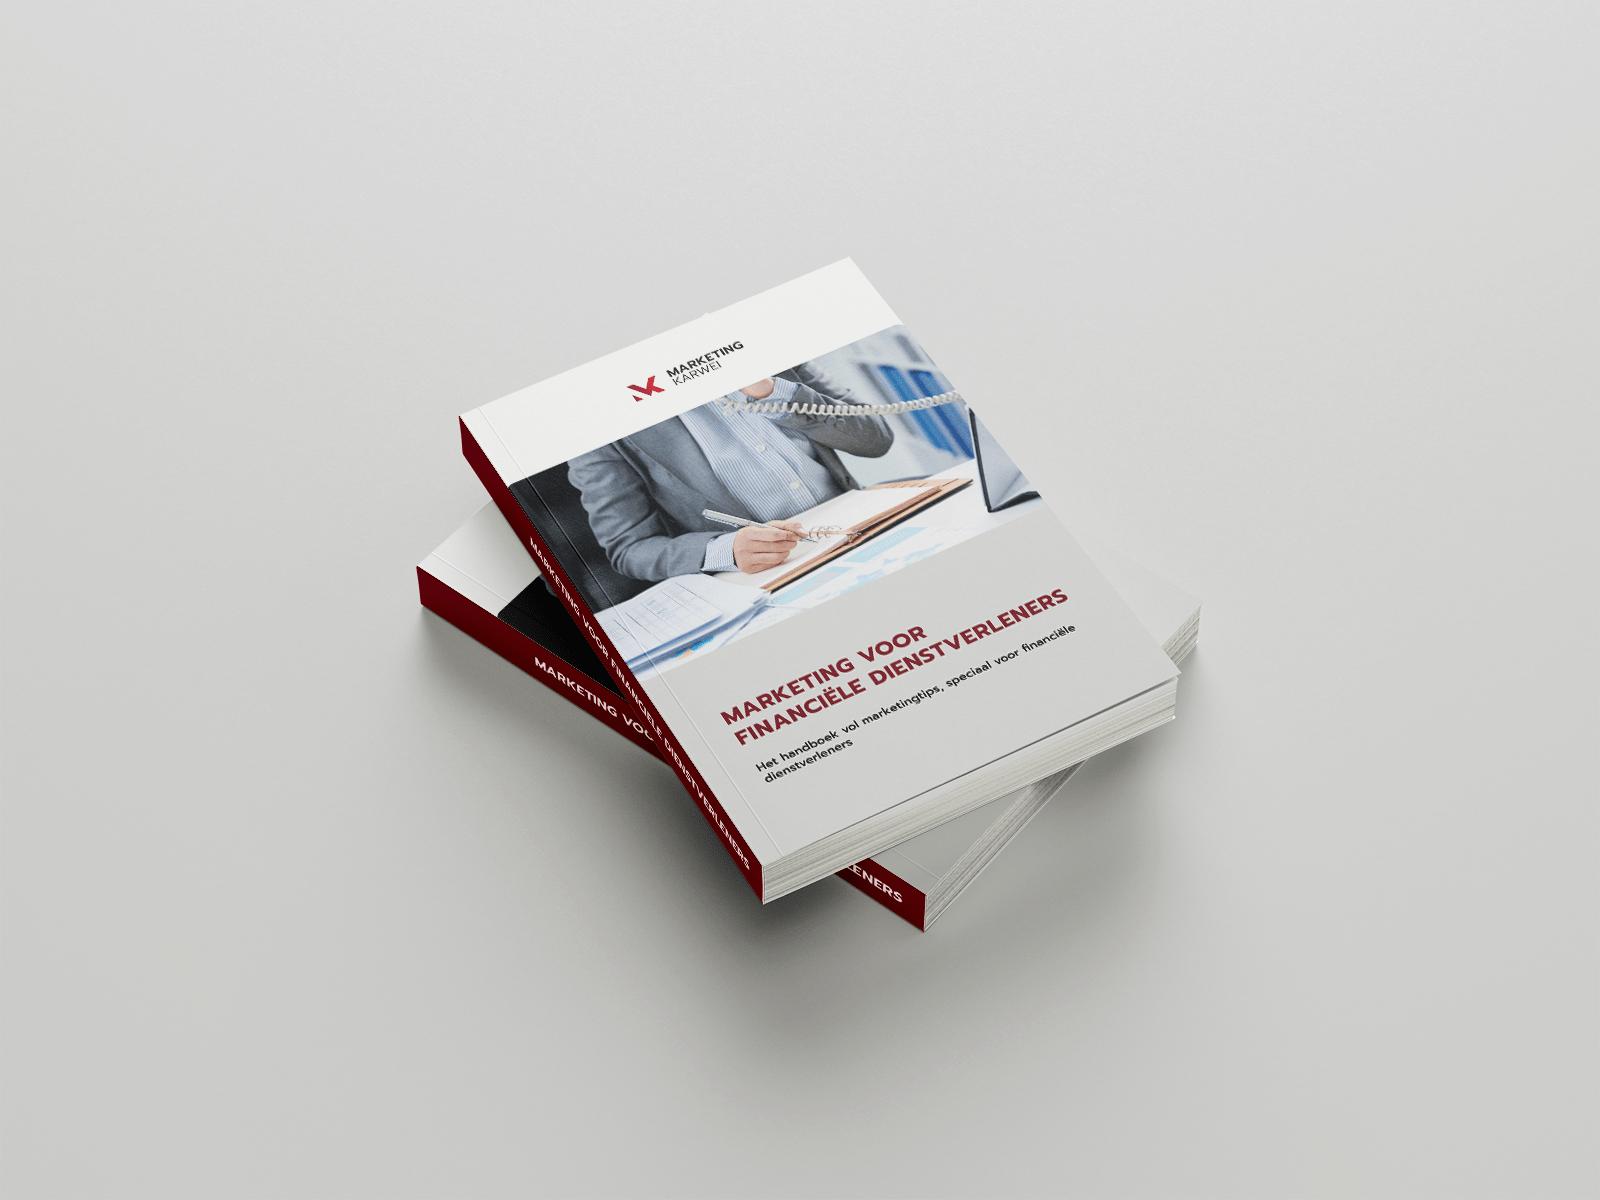 Financiële dienstverlening marketing whitepaper